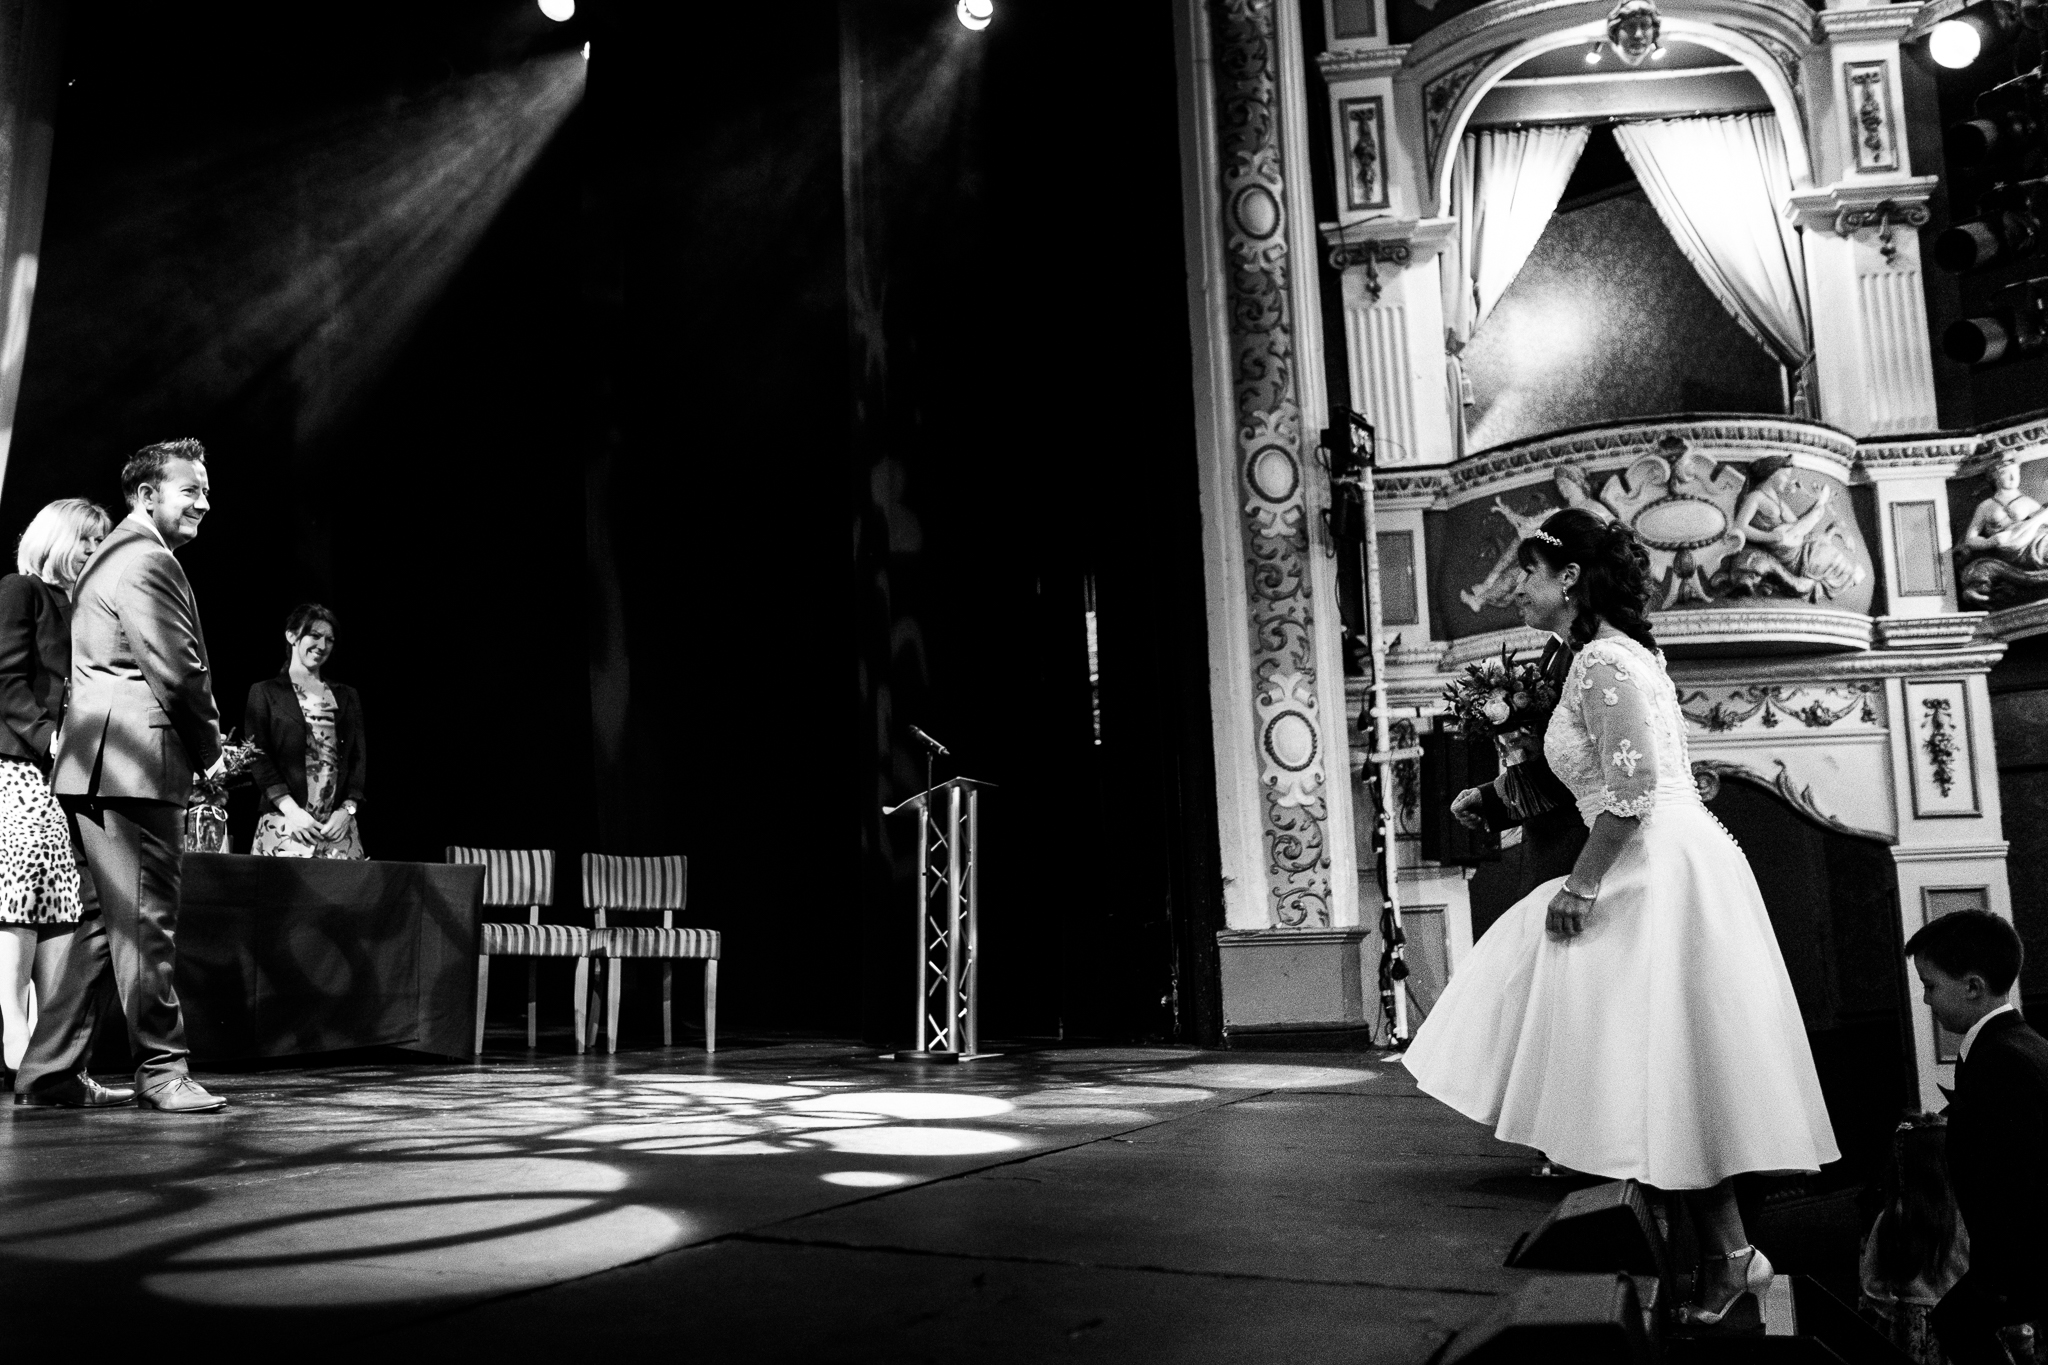 Cheshire Wedding Photography at Crewe Lyceum Theatre Stage Wedding Art Deco 20s - Jenny Harper-17.jpg